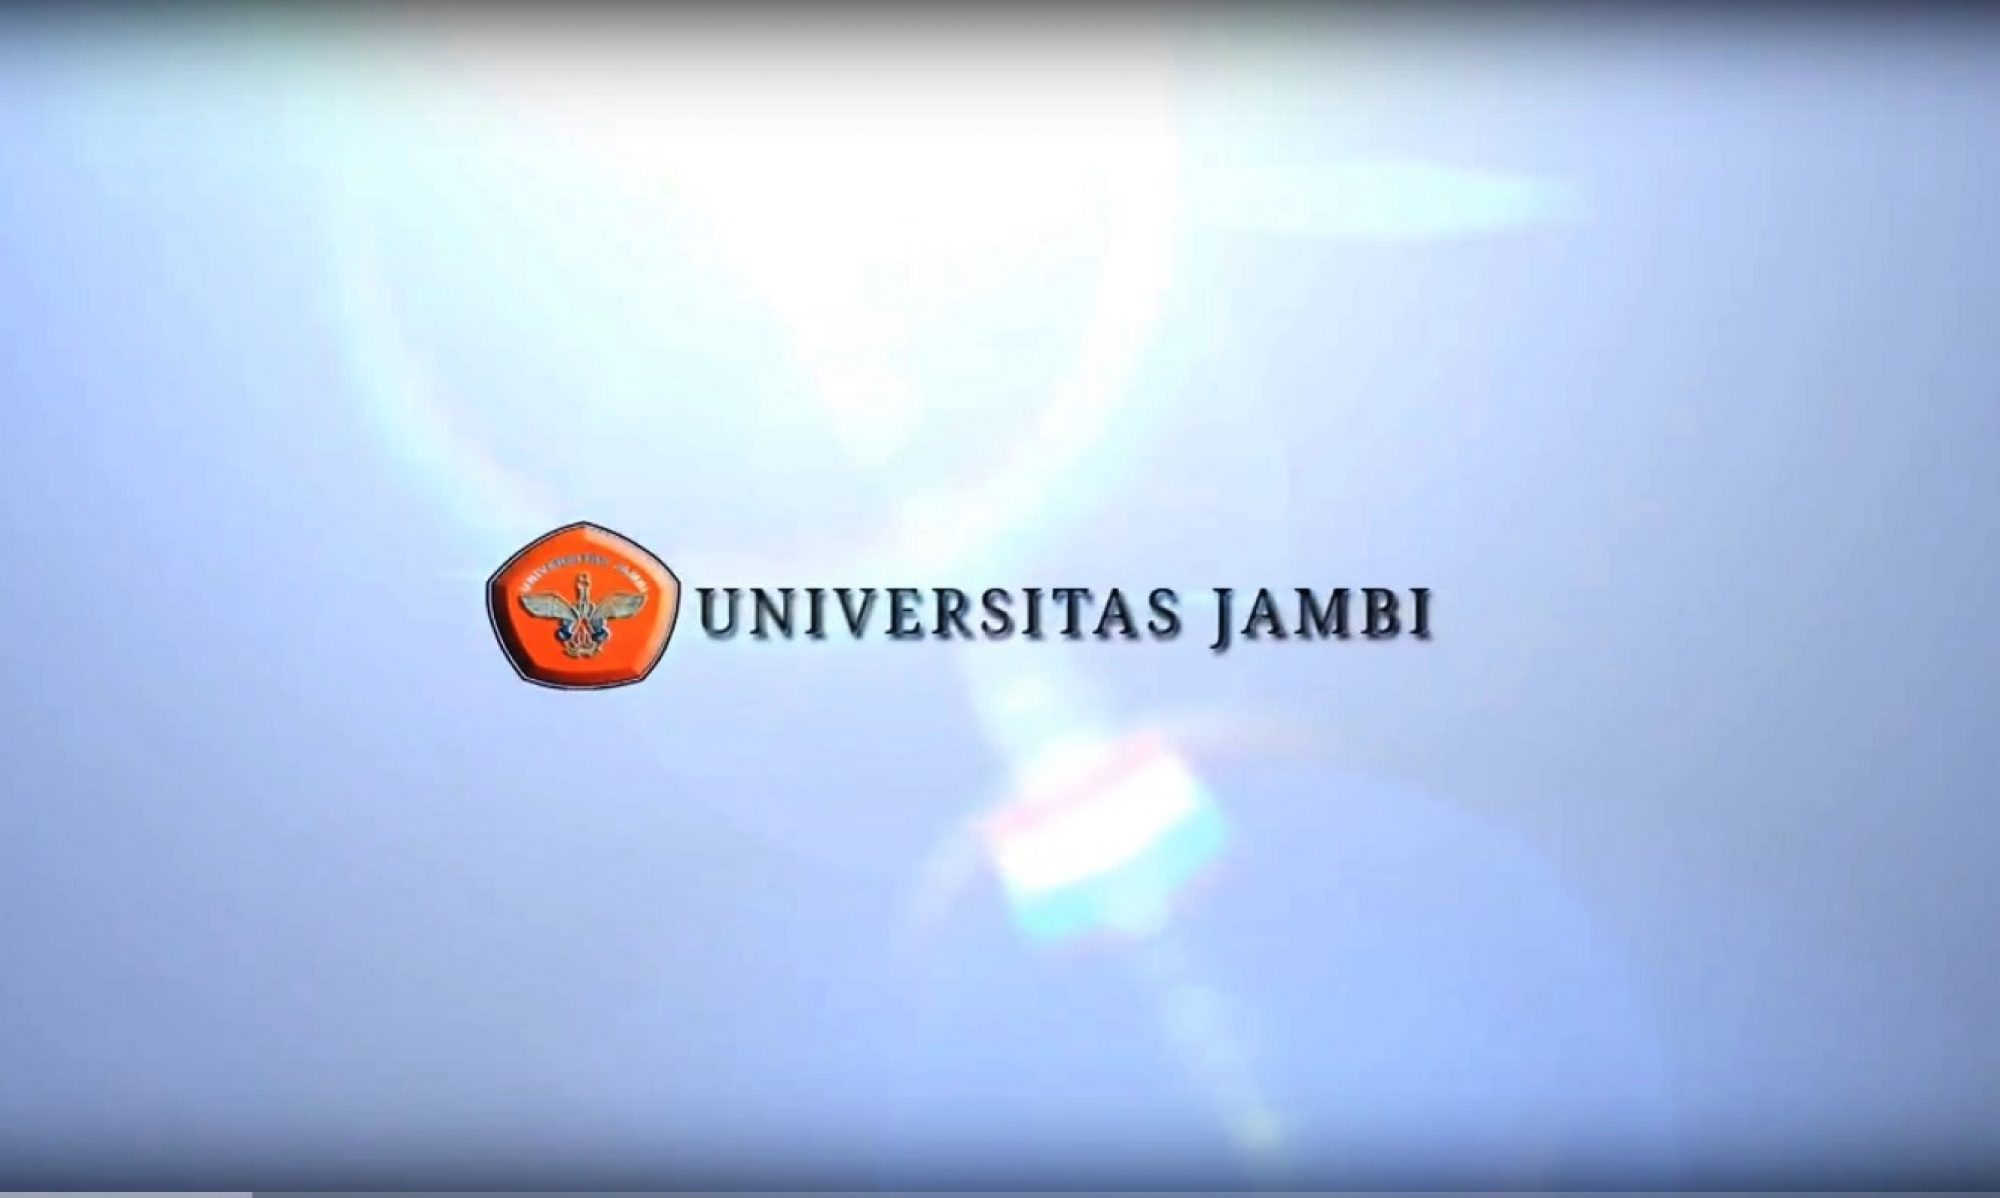 Dosen dan Pegawai Universitas Jambi